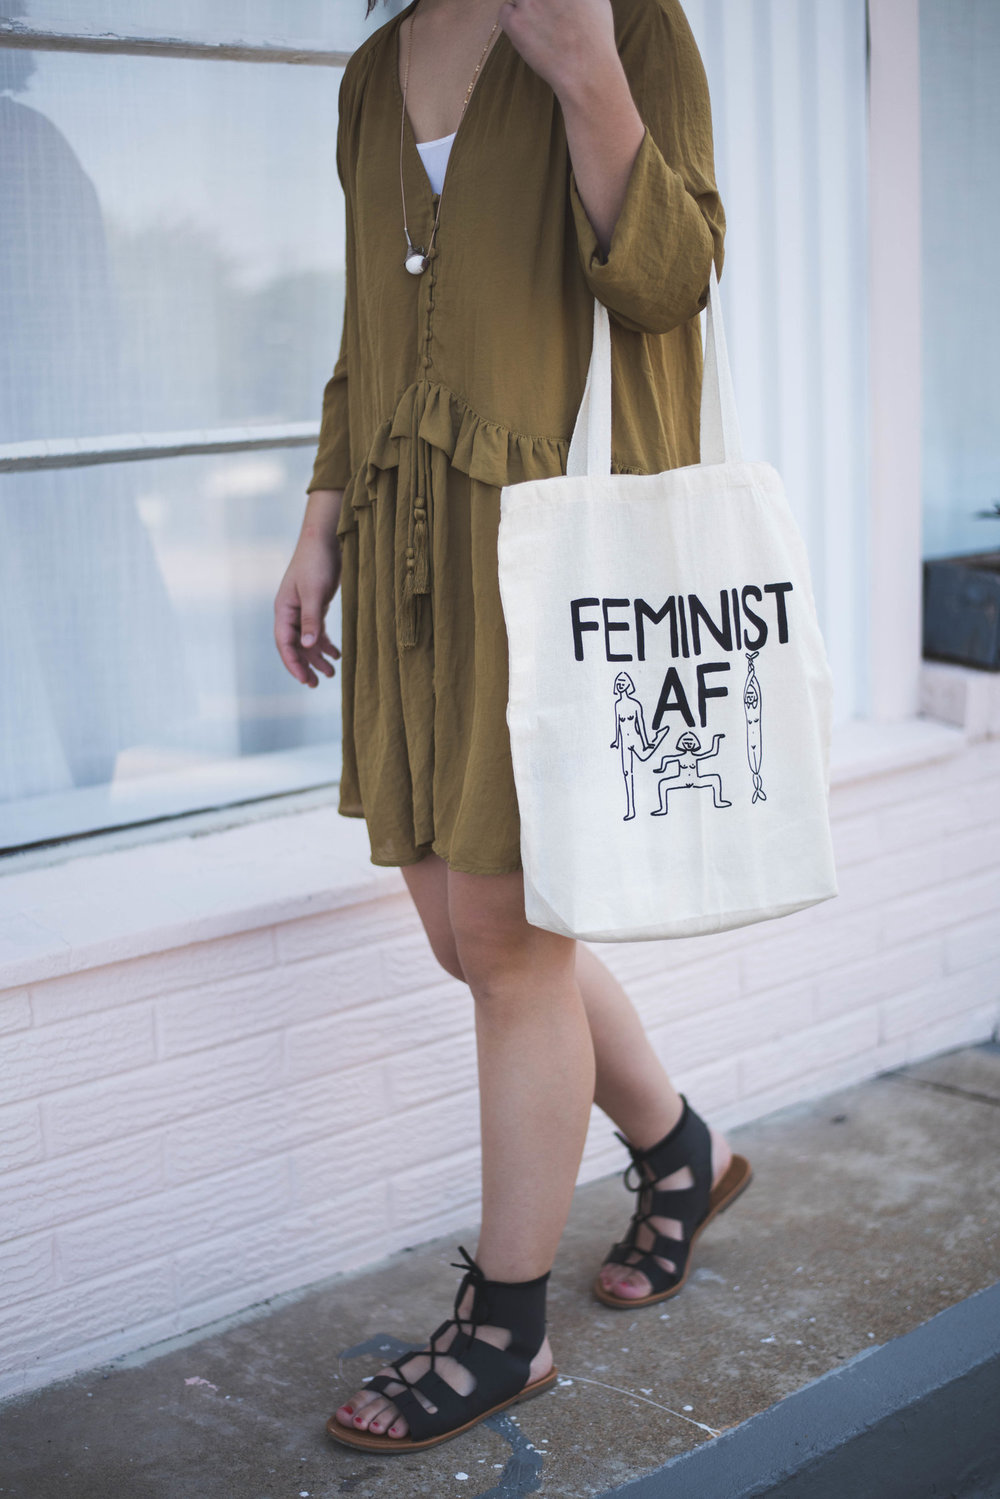 Feminist AF Tote Bag  - Paris Woodhull Illustrations • $15